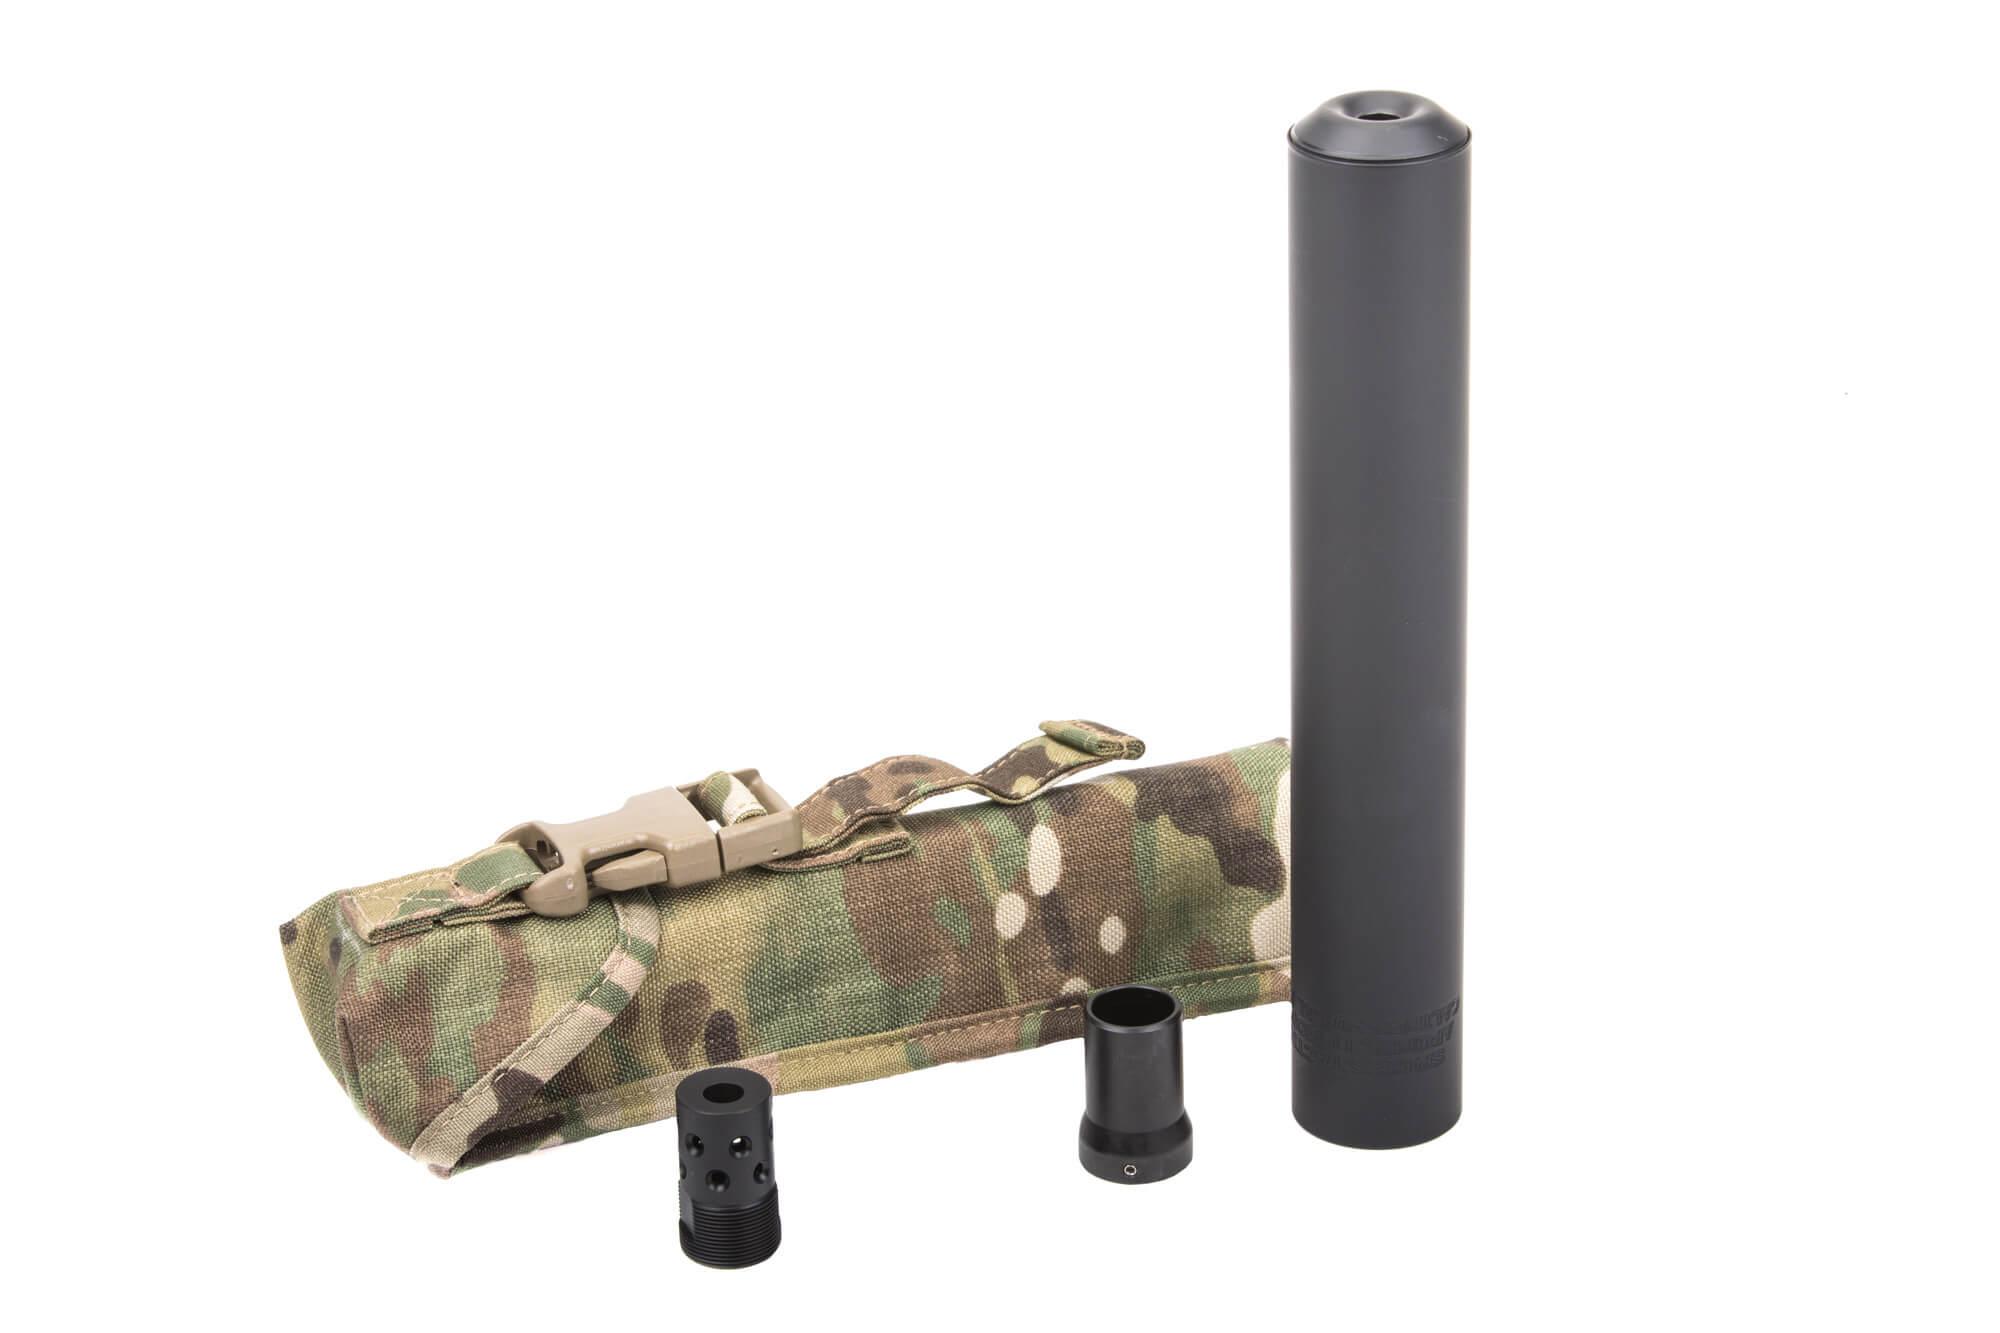 LRS (Long Reflex Suppressor)